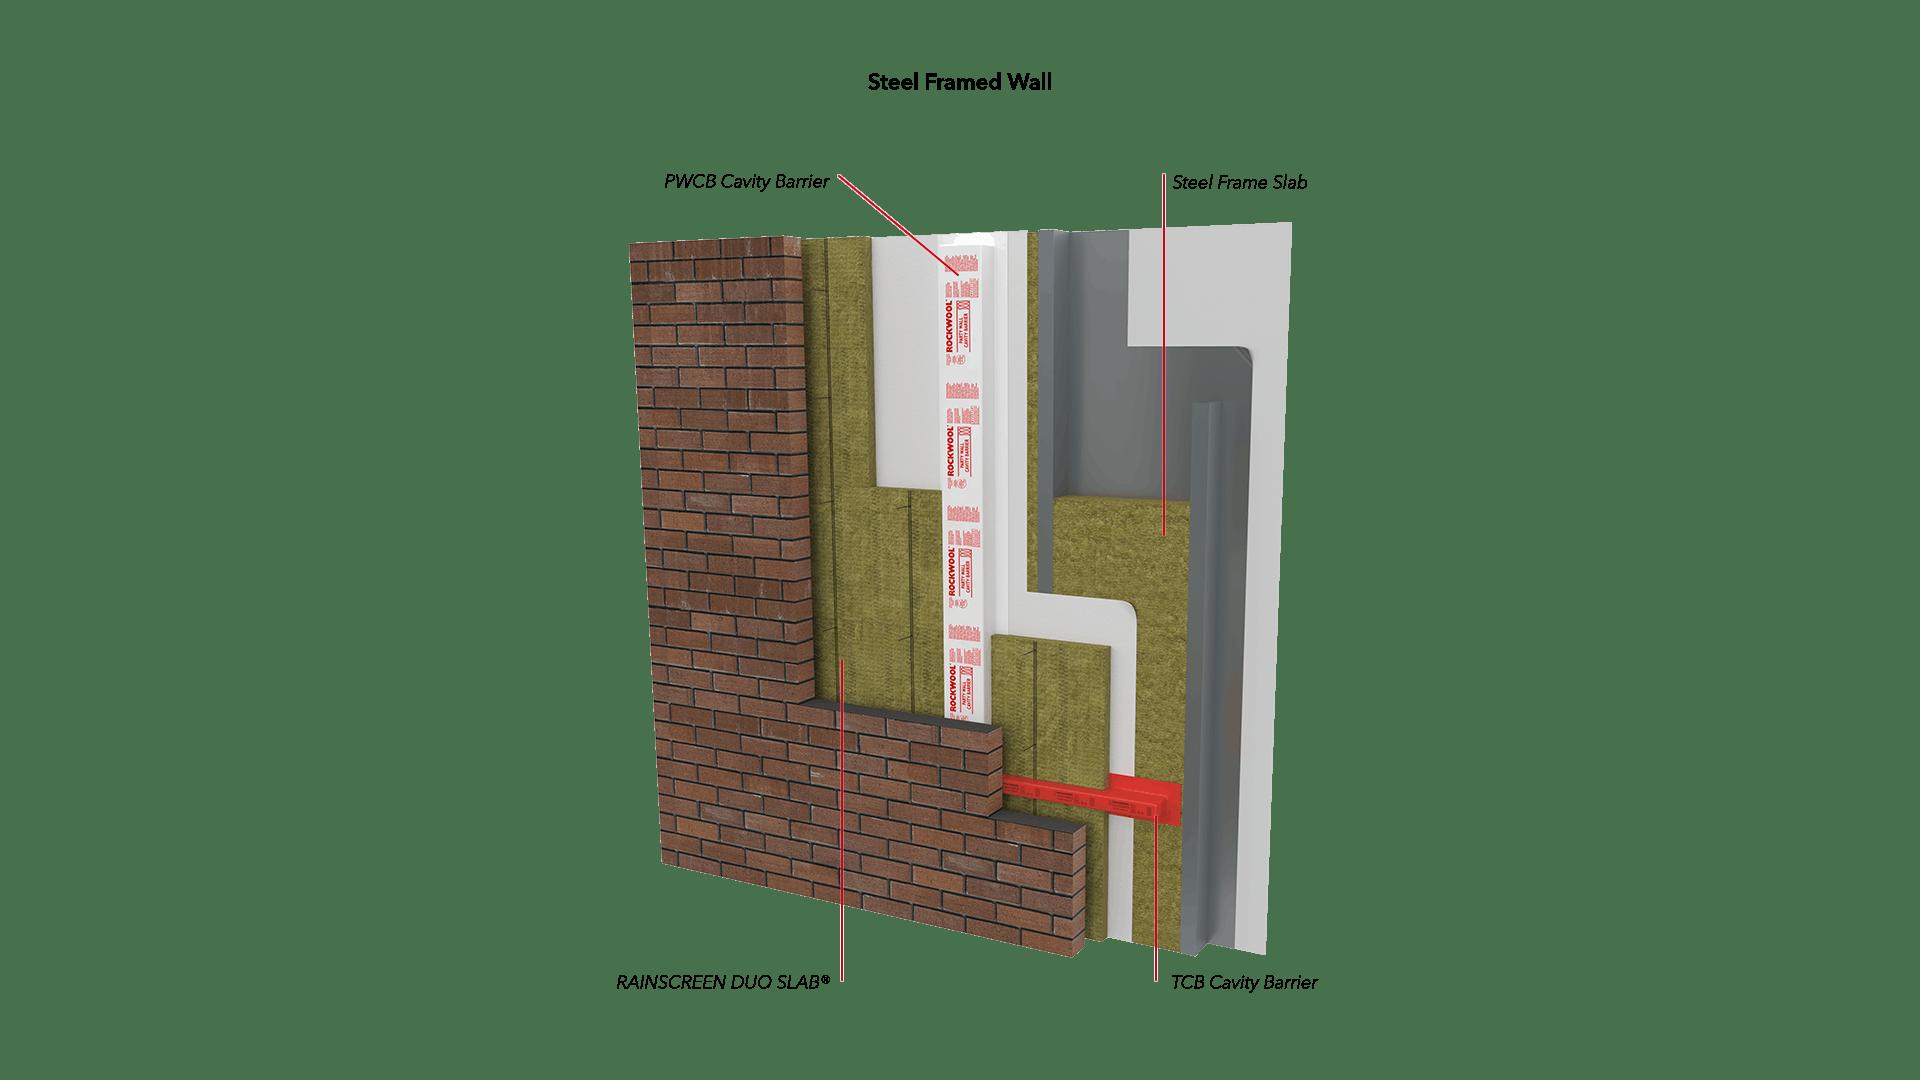 Steel Frame Wall - Steel Frame Slab, RAINSCREEN DUO, PWCB, TCB